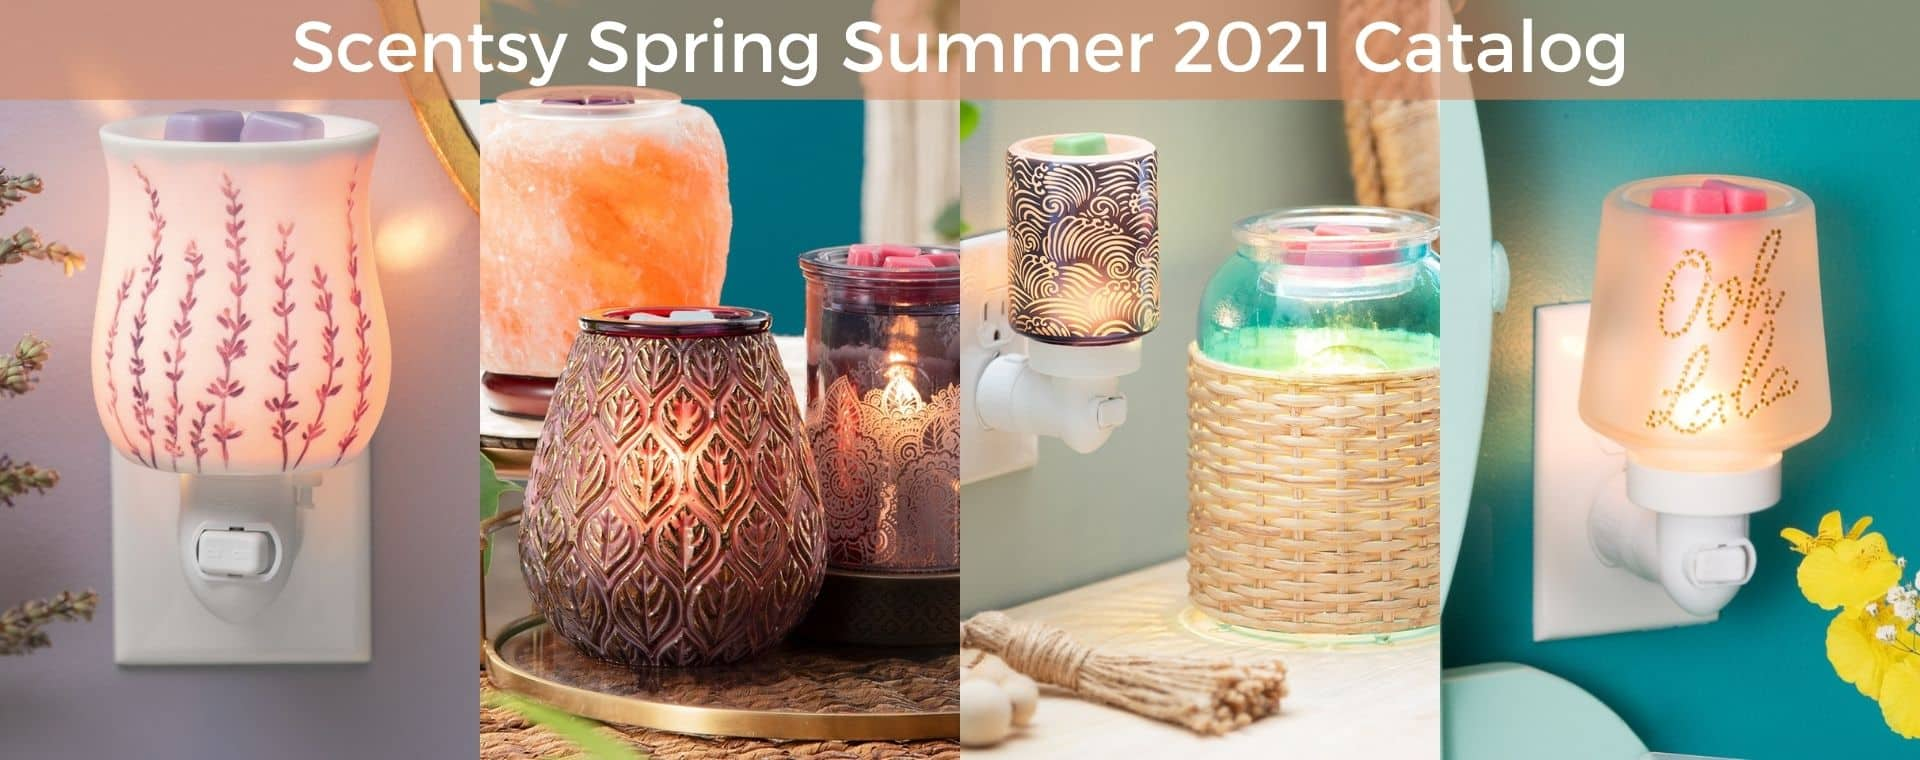 Scentsy Spring 2021 Catalog 1 1